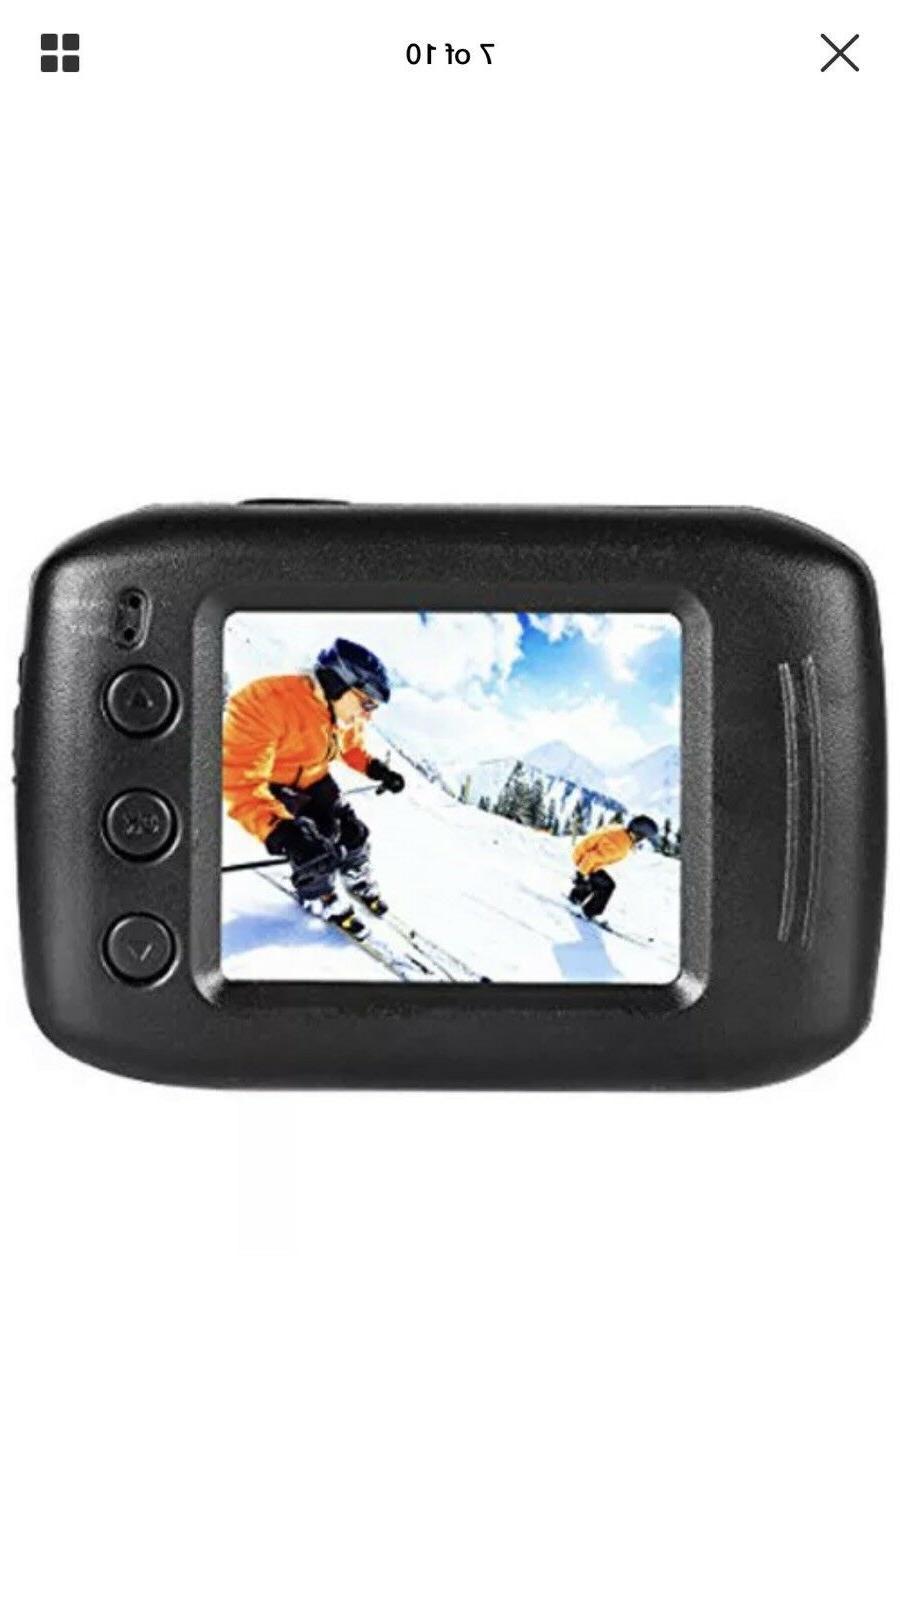 1 LOT Vivitar - Cameras Camcorder Silver *FREE SHIPING*